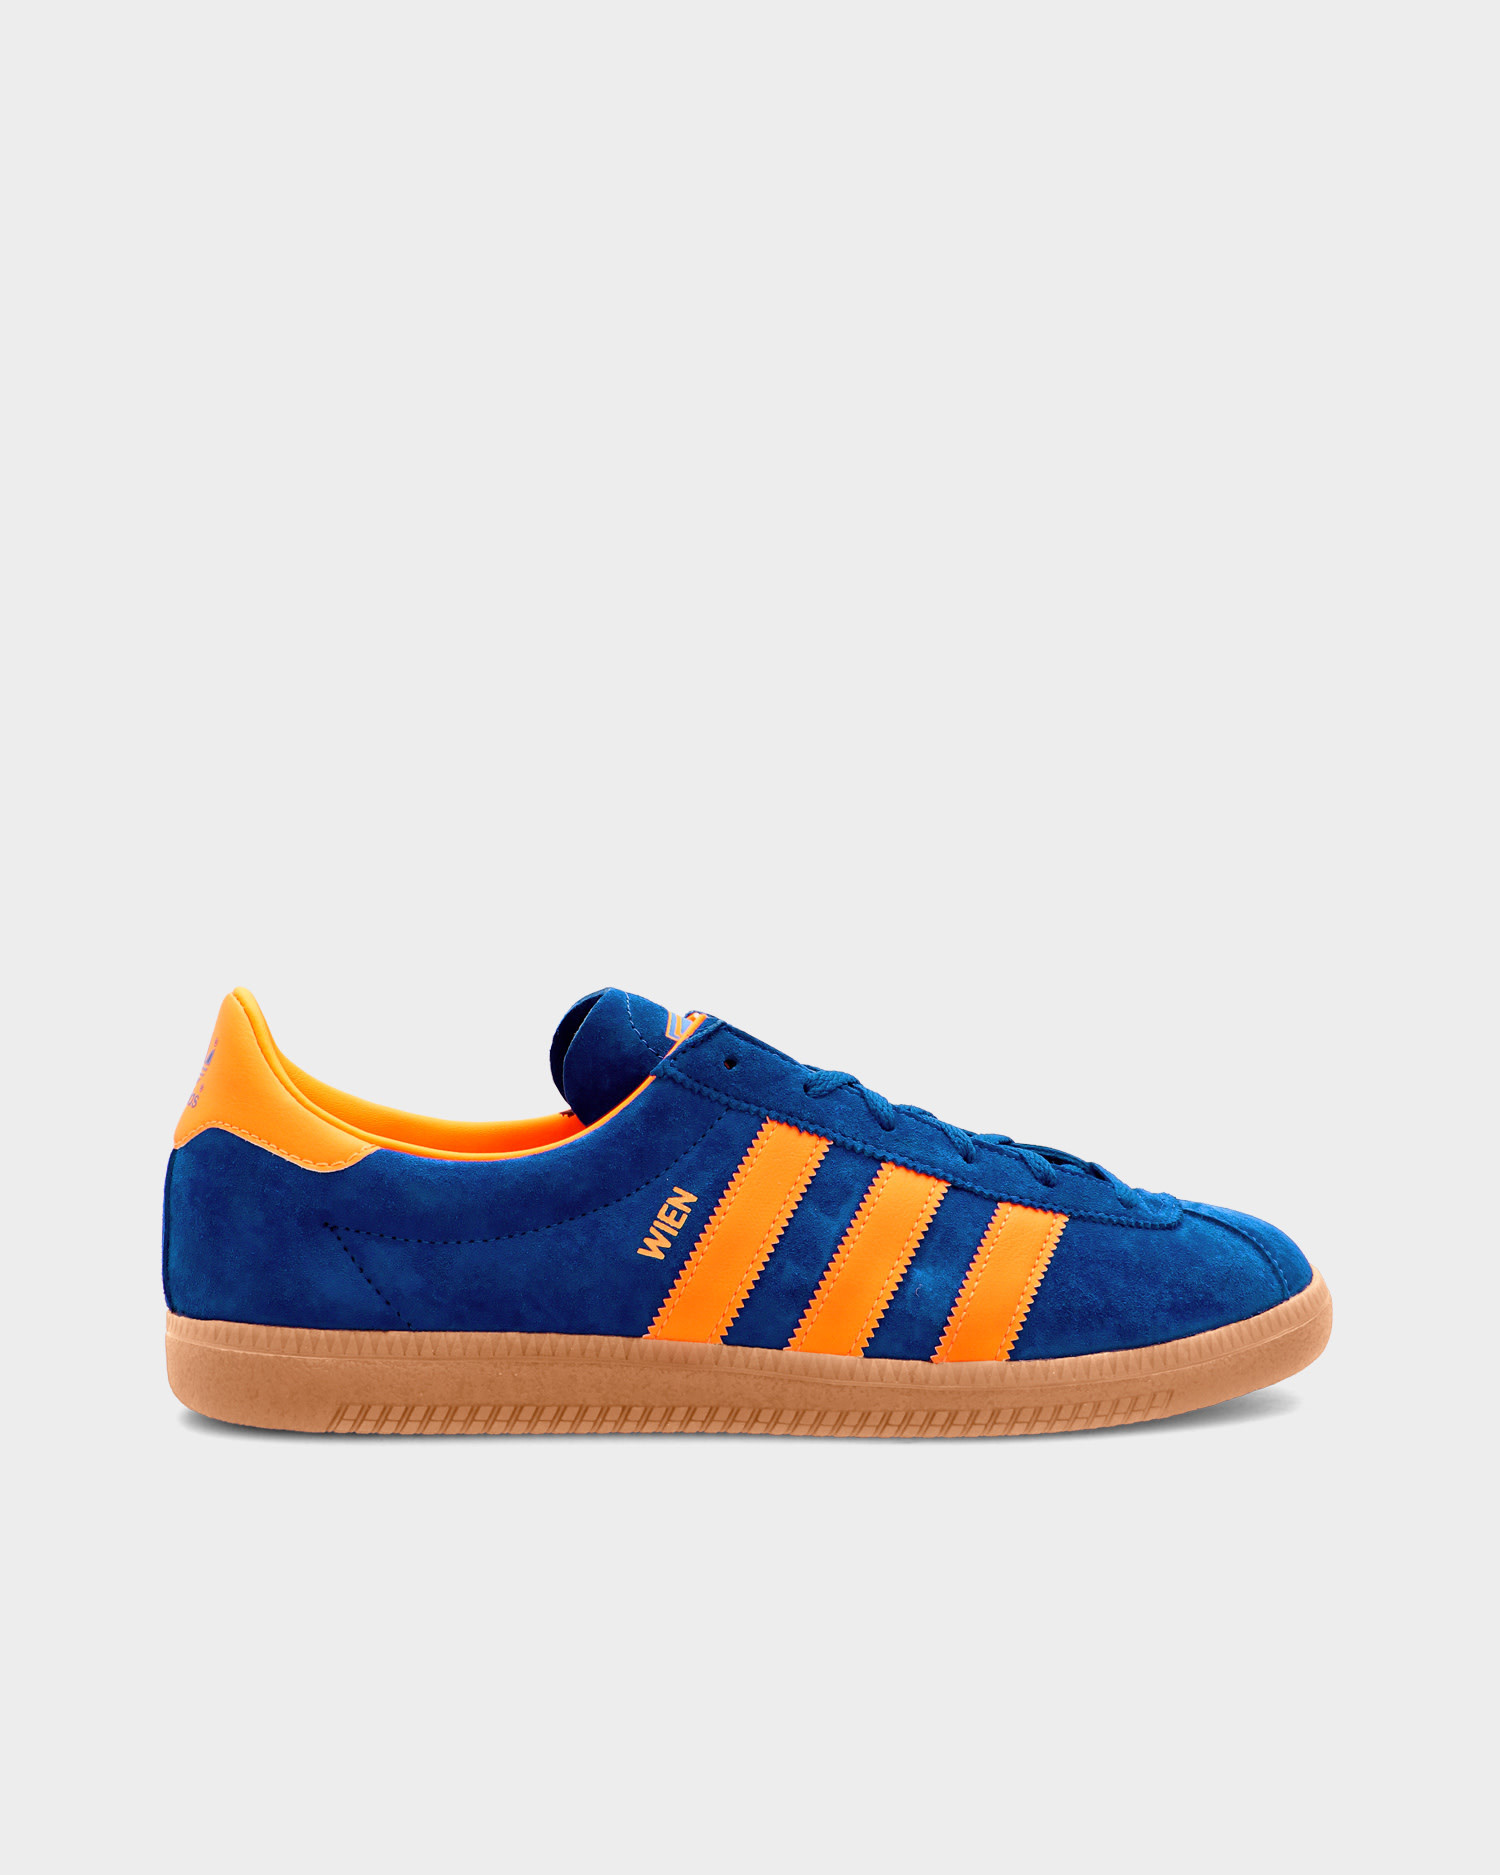 Adidas Wien Priink/Flaora/Blubir